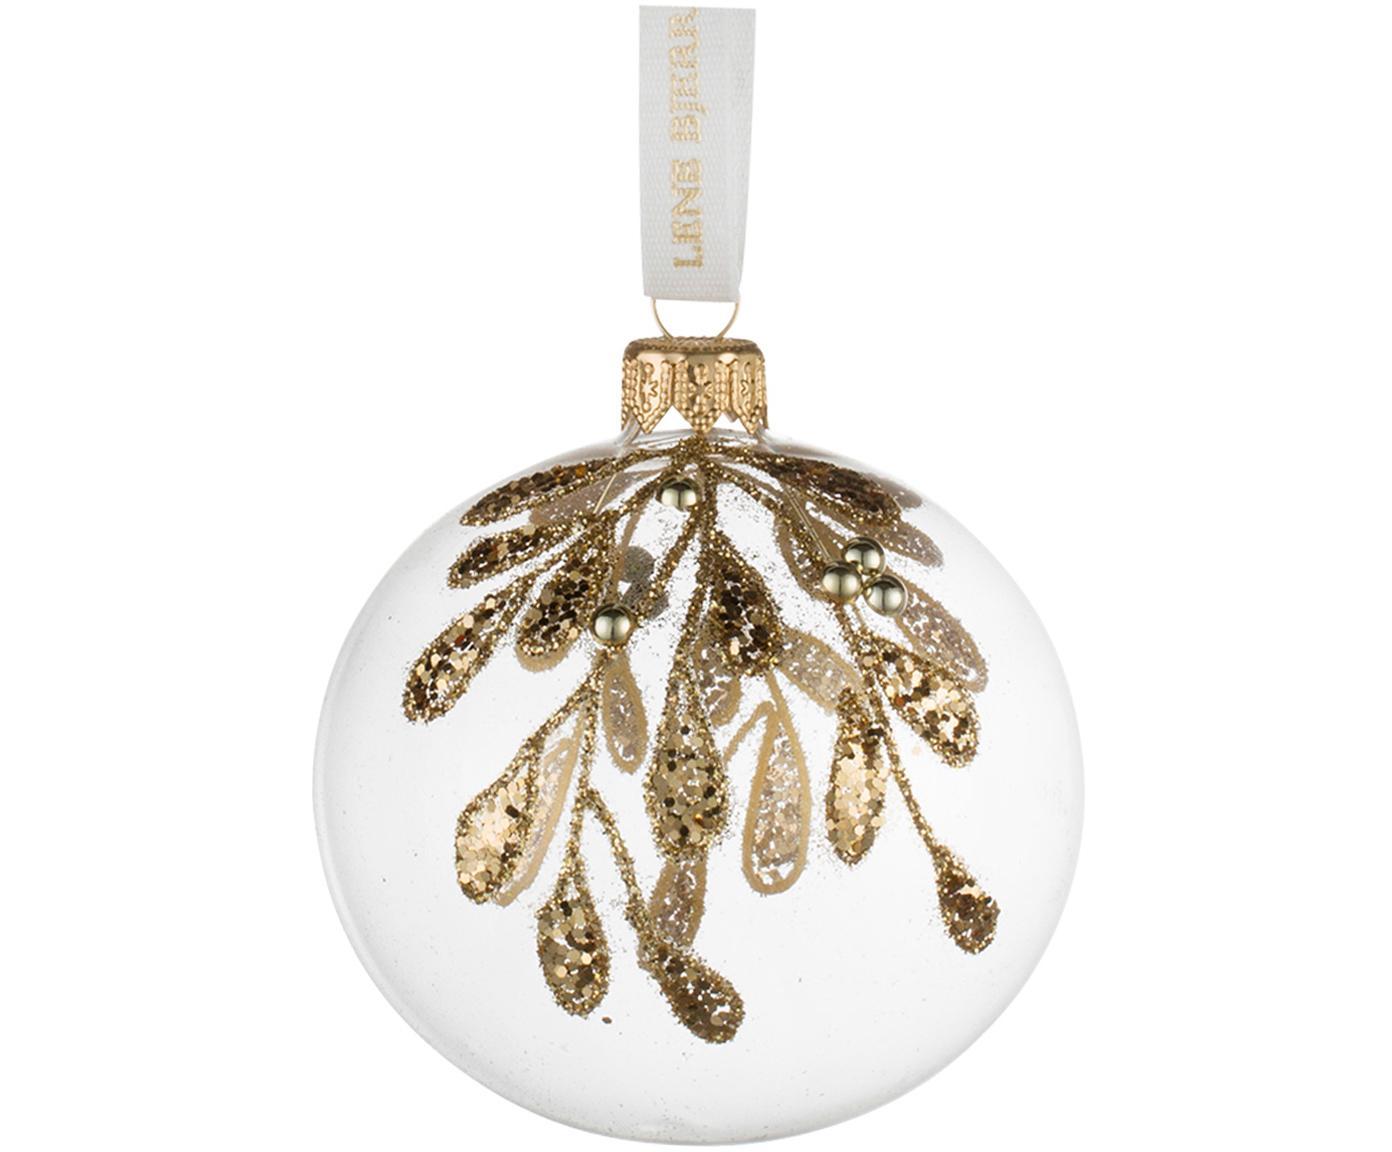 Weihnachtskugeln Cadelia, 2 Stück, Transparent, Goldfarben, Ø 8 cm